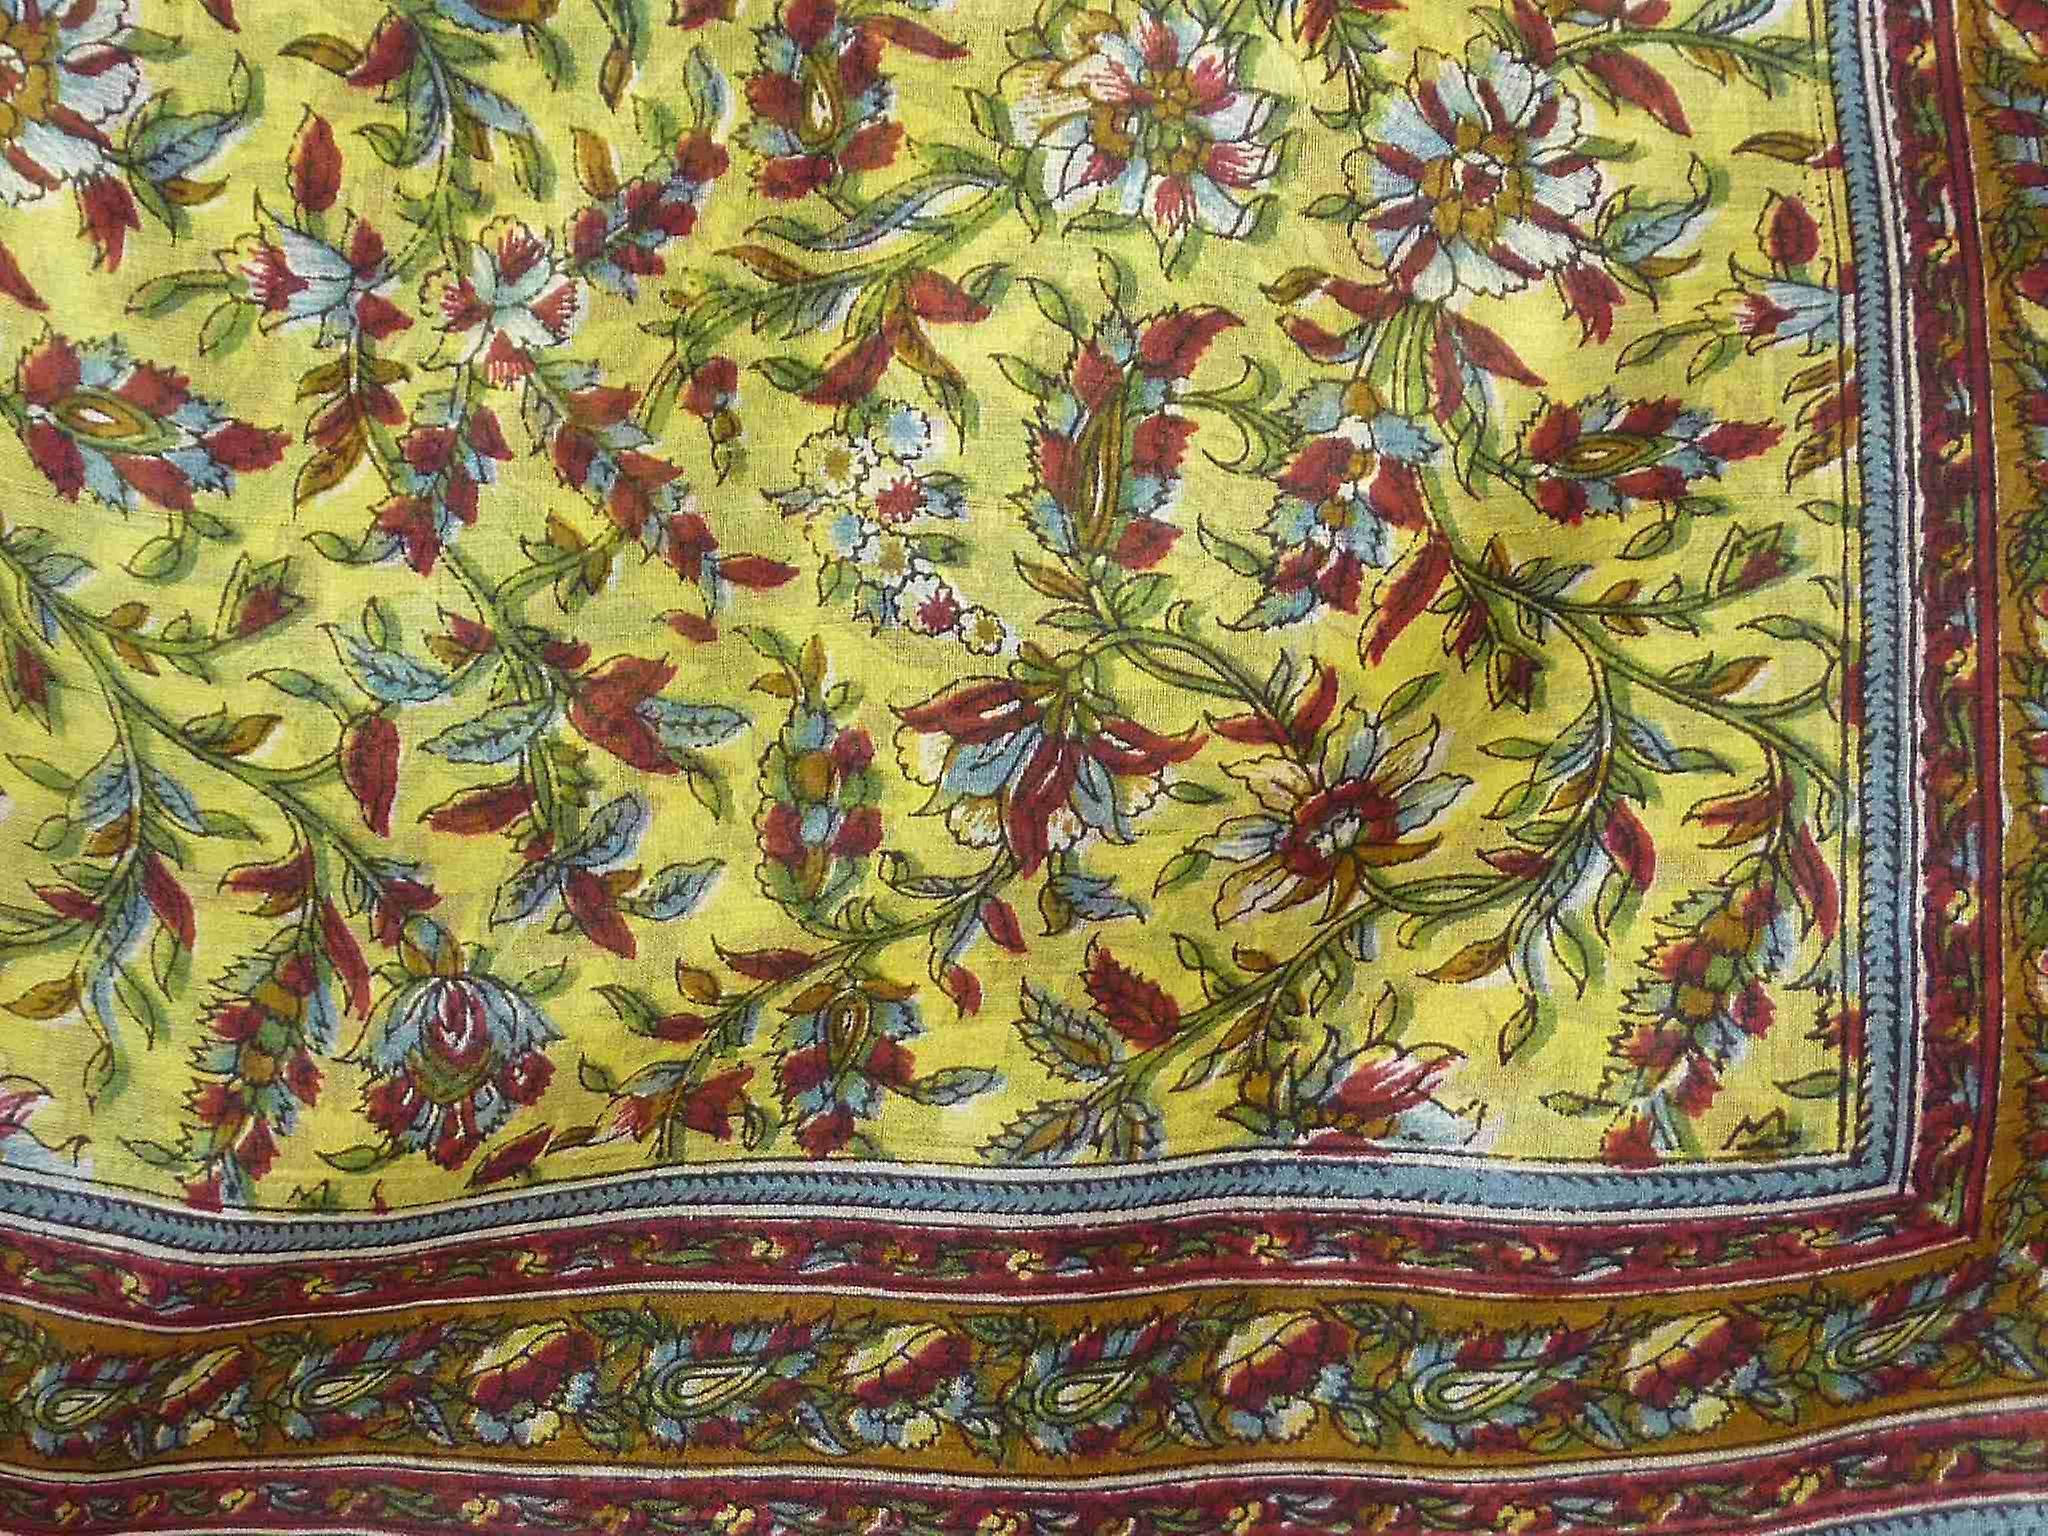 Mulberry Silk Traditional Square Scarf Lamu Caramel by Pashmina & Silk